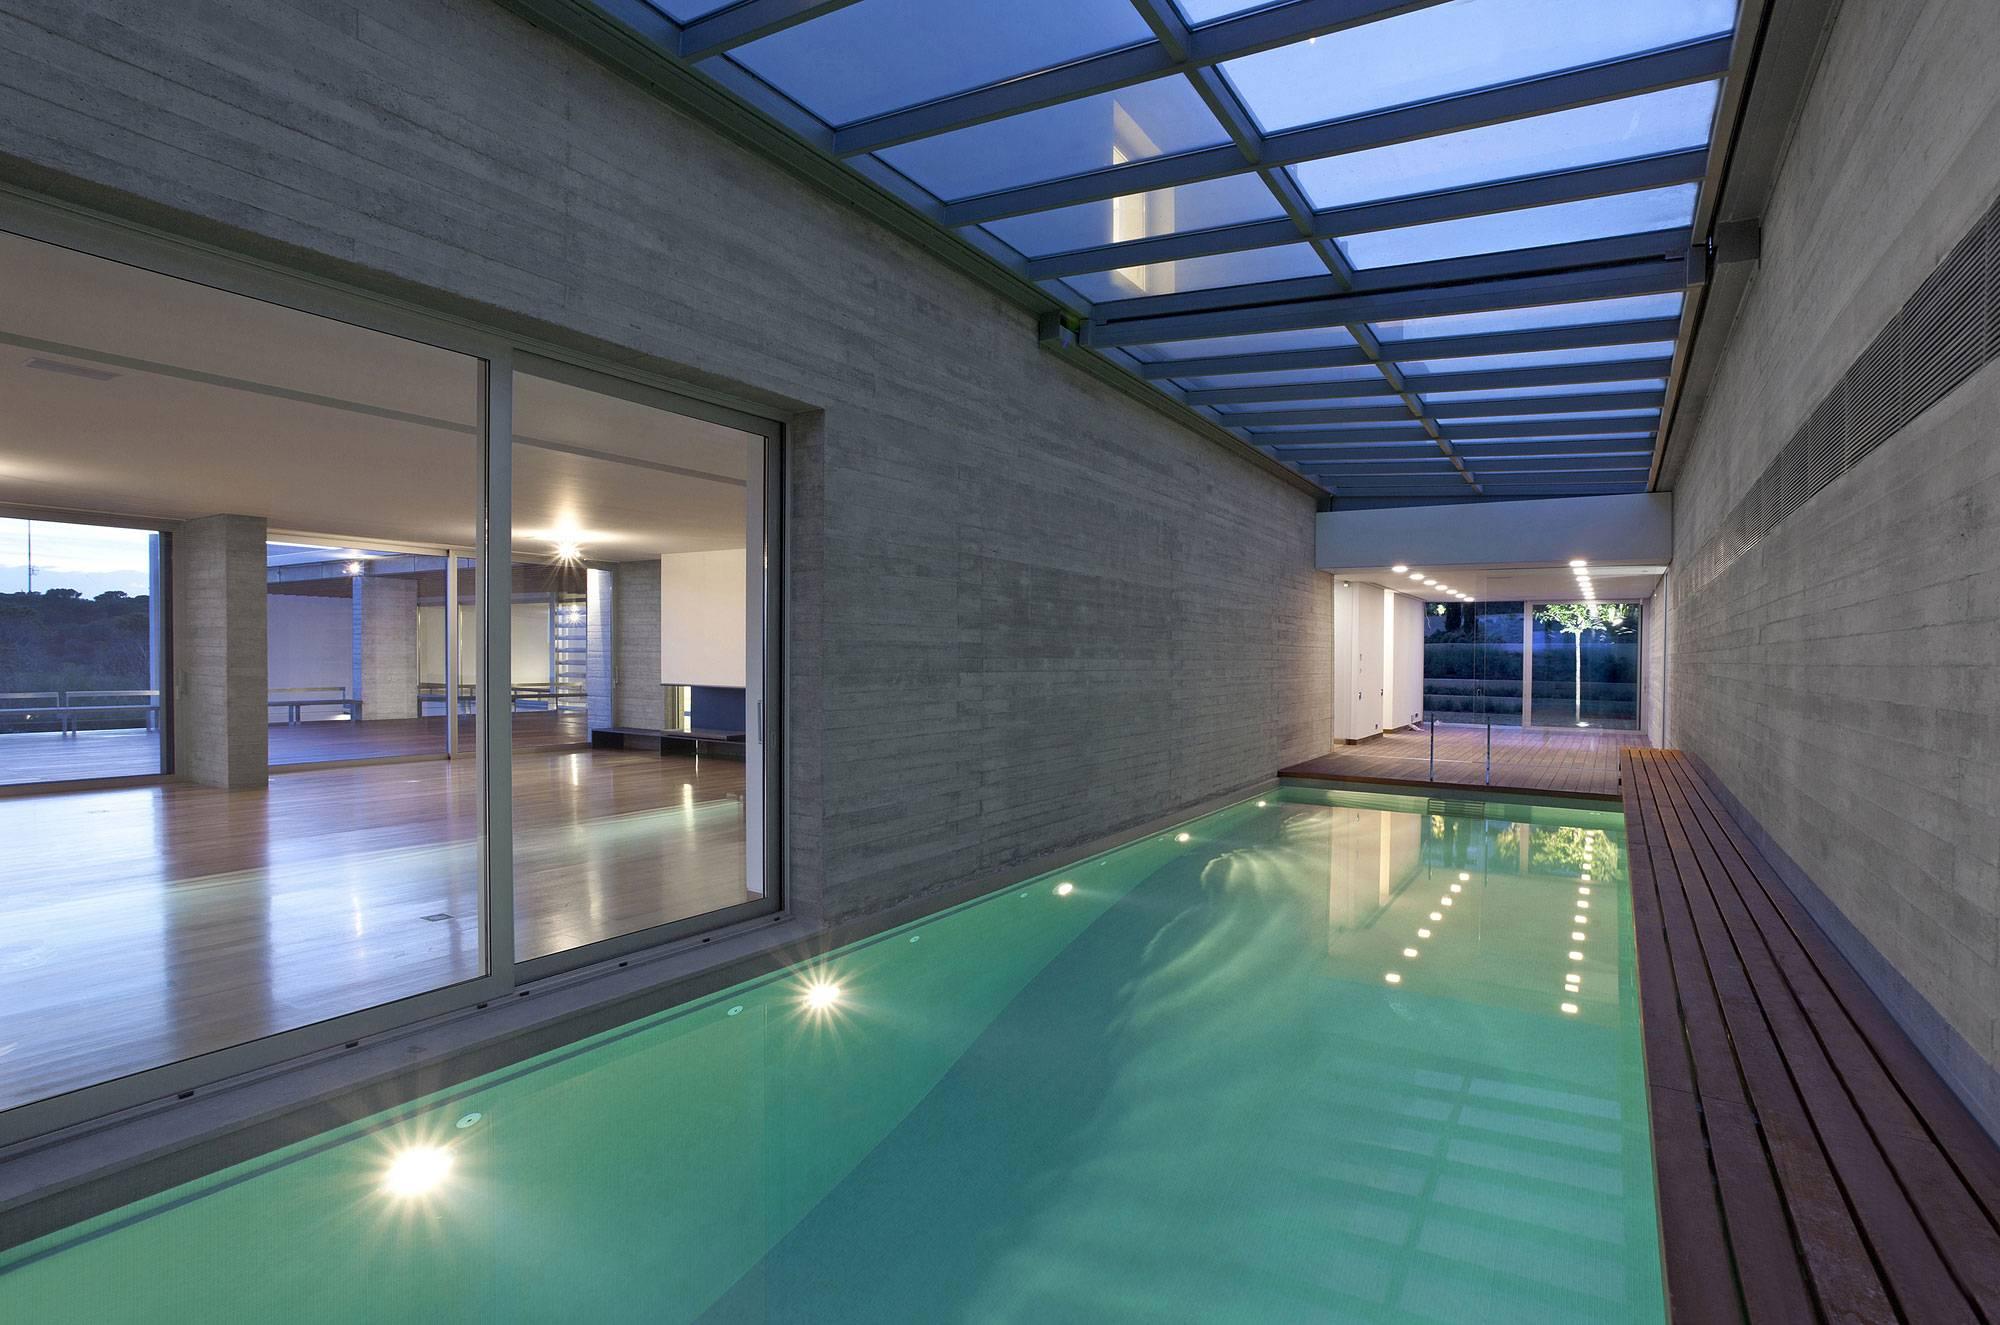 Modern House Indoor Pool Design House Plans 63591